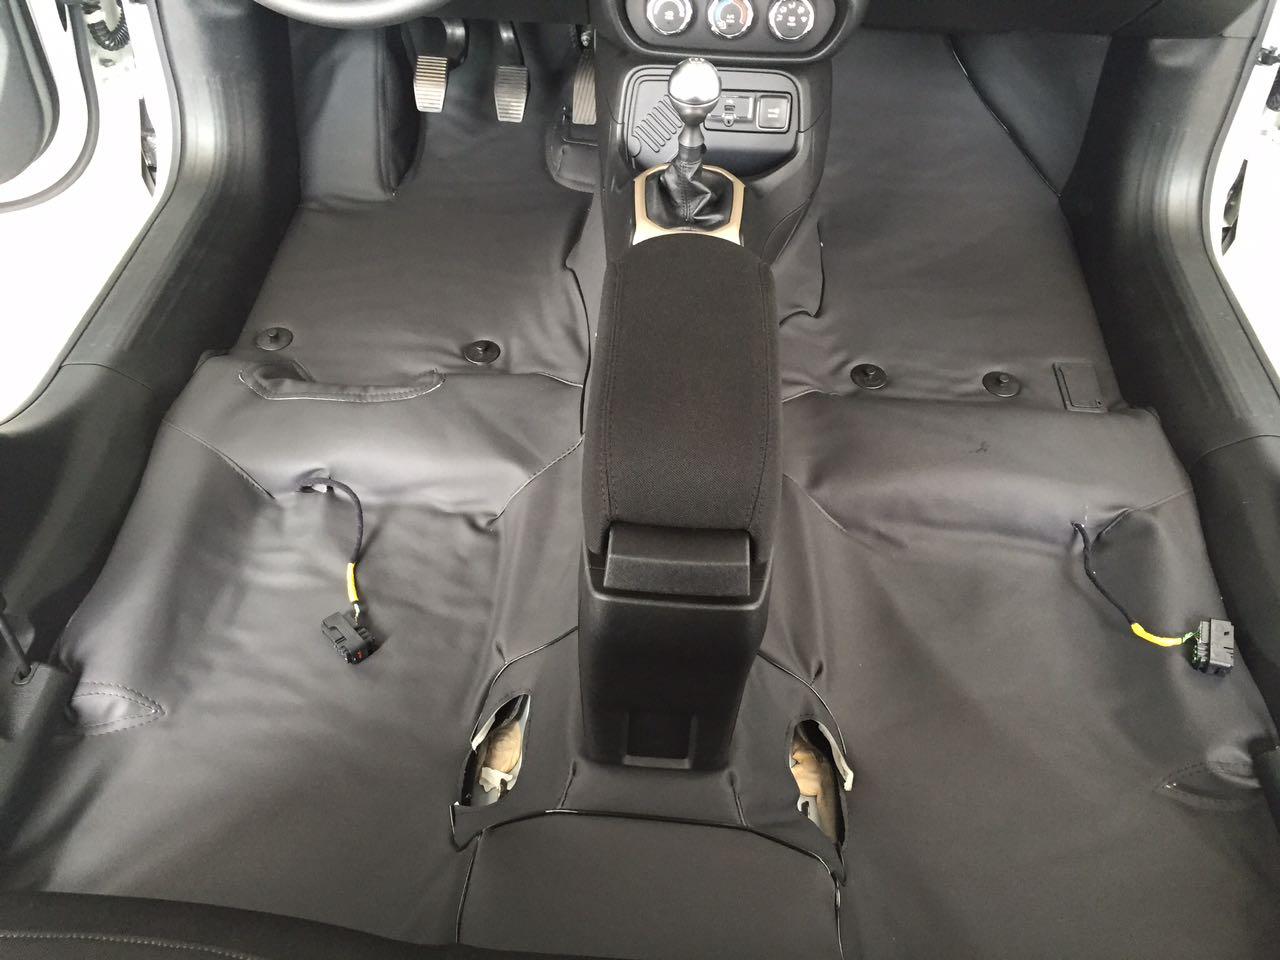 tapete Super Luxo Automotivo Assoalho ford Del Rey Todos